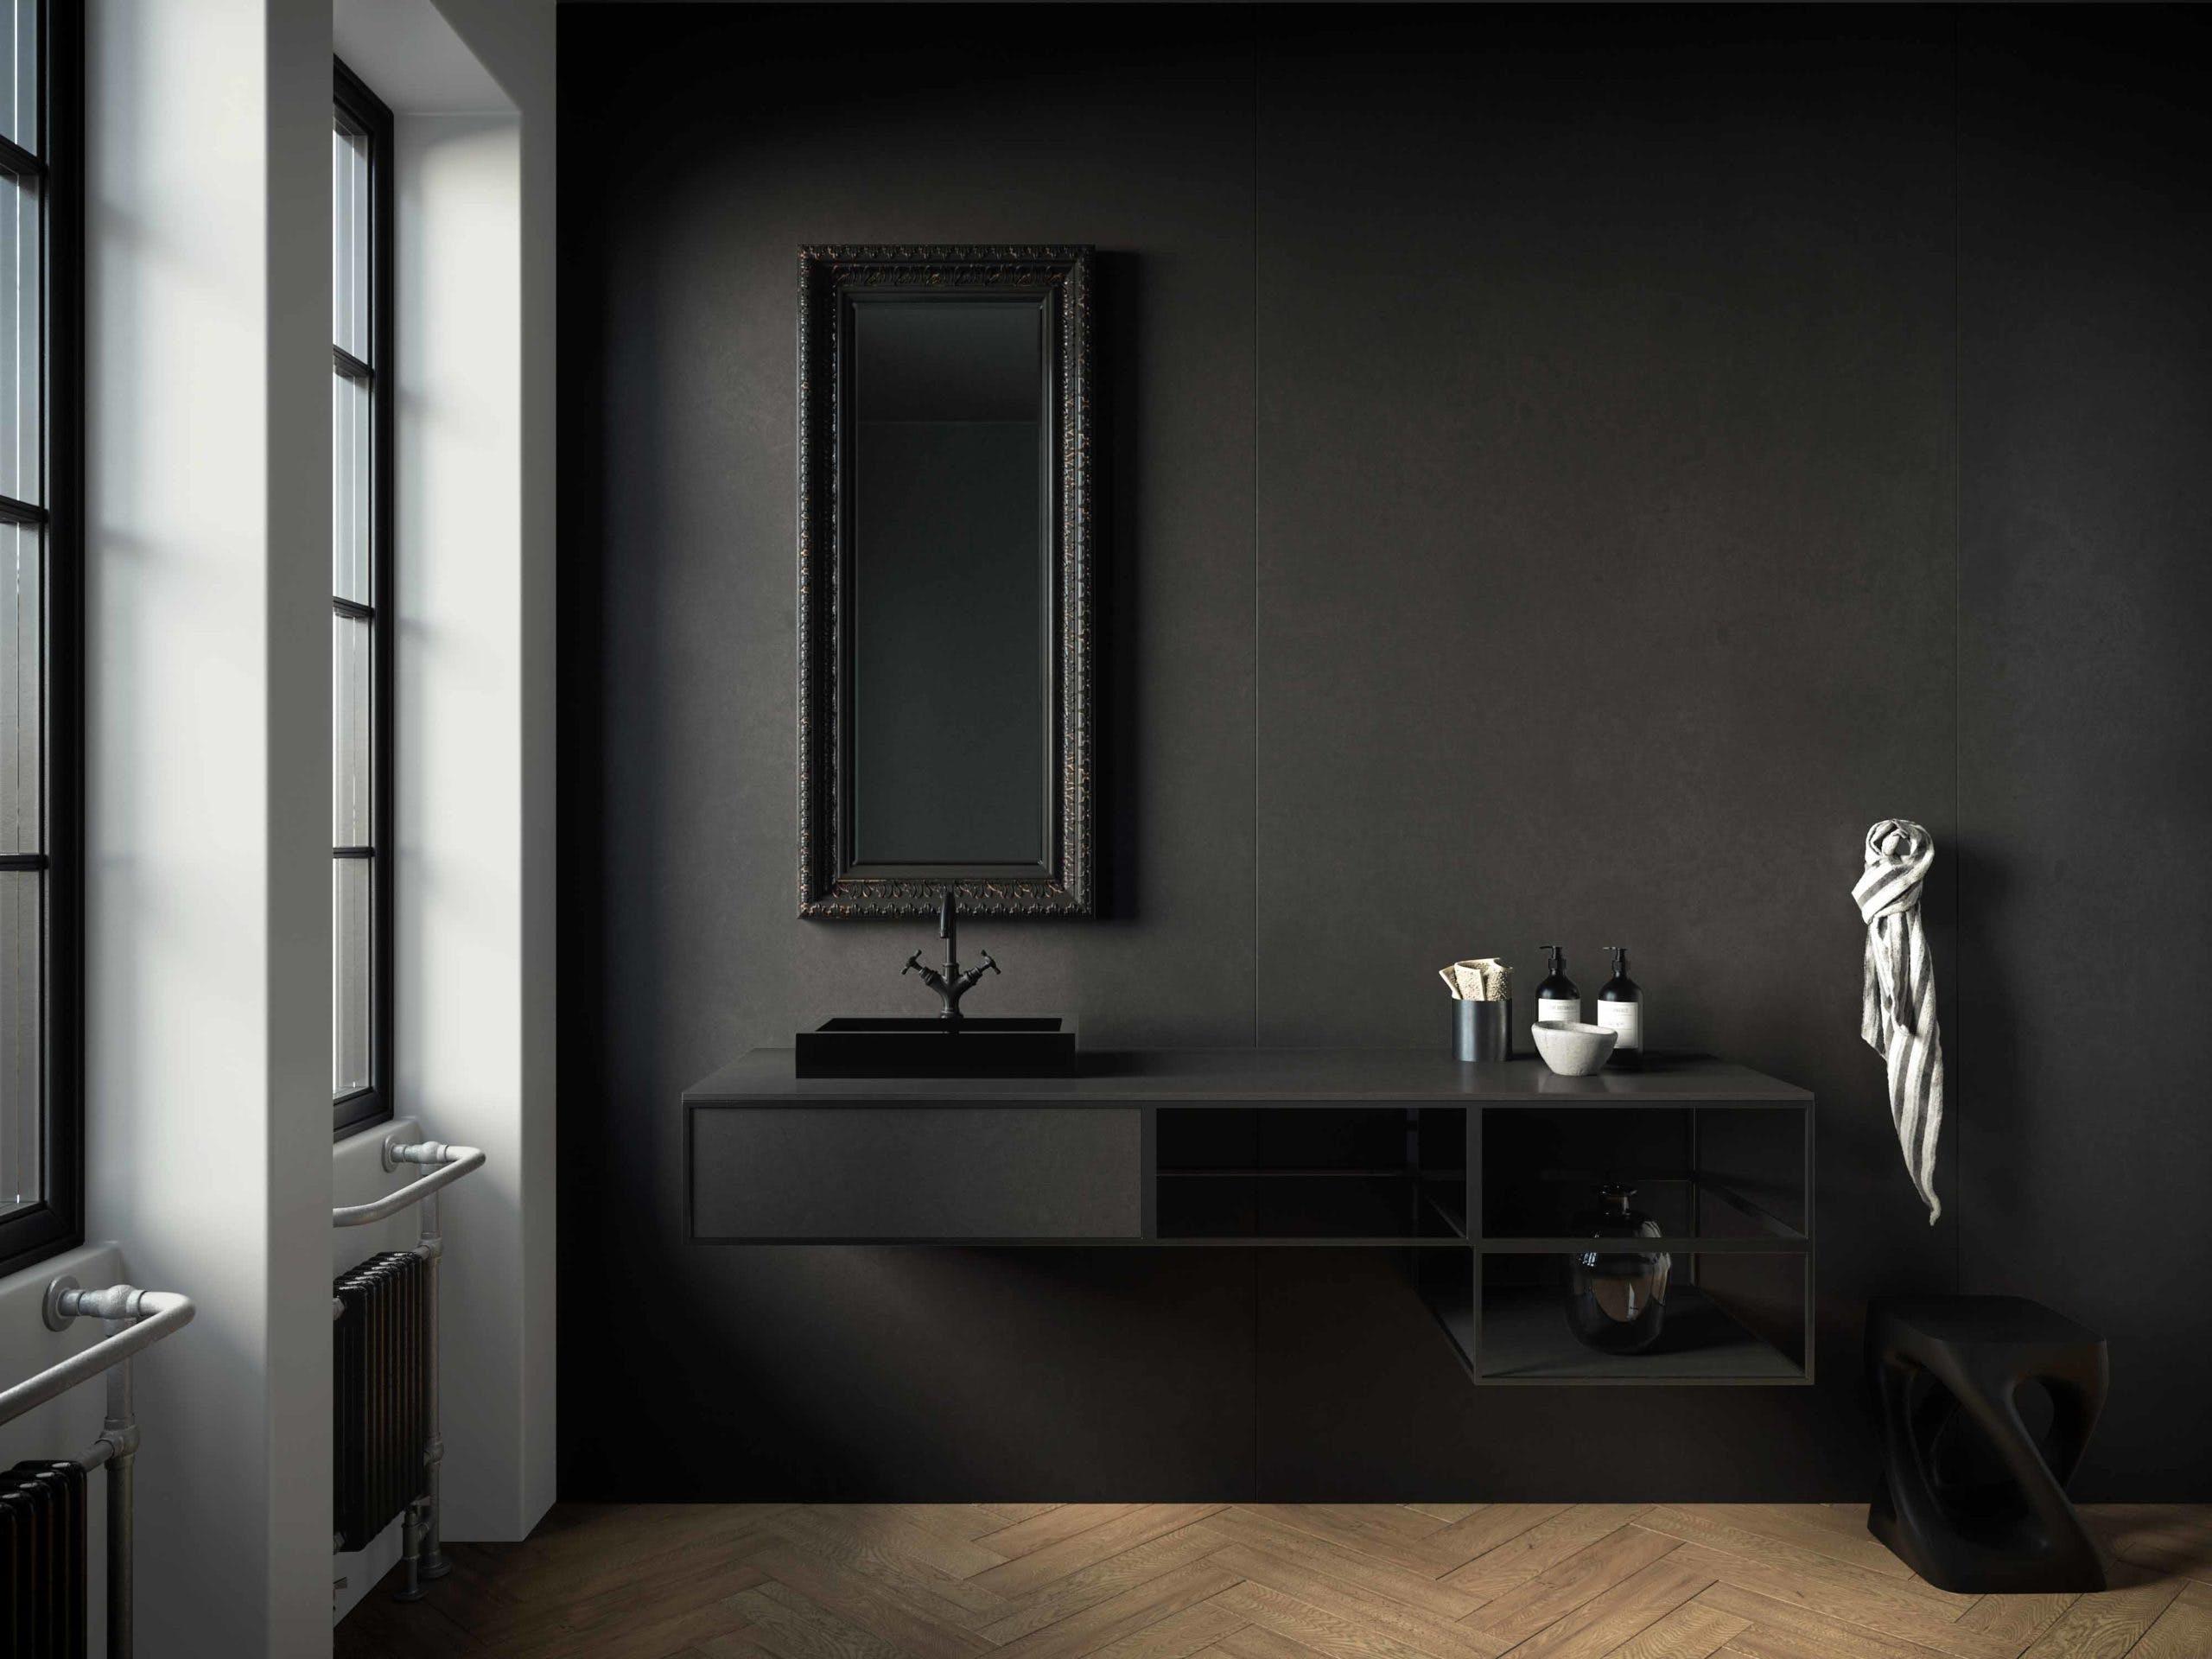 Image of Dekton Bathroom Eter blog 1 scaled 1 in Dekton® Portfolio'20 - Cosentino